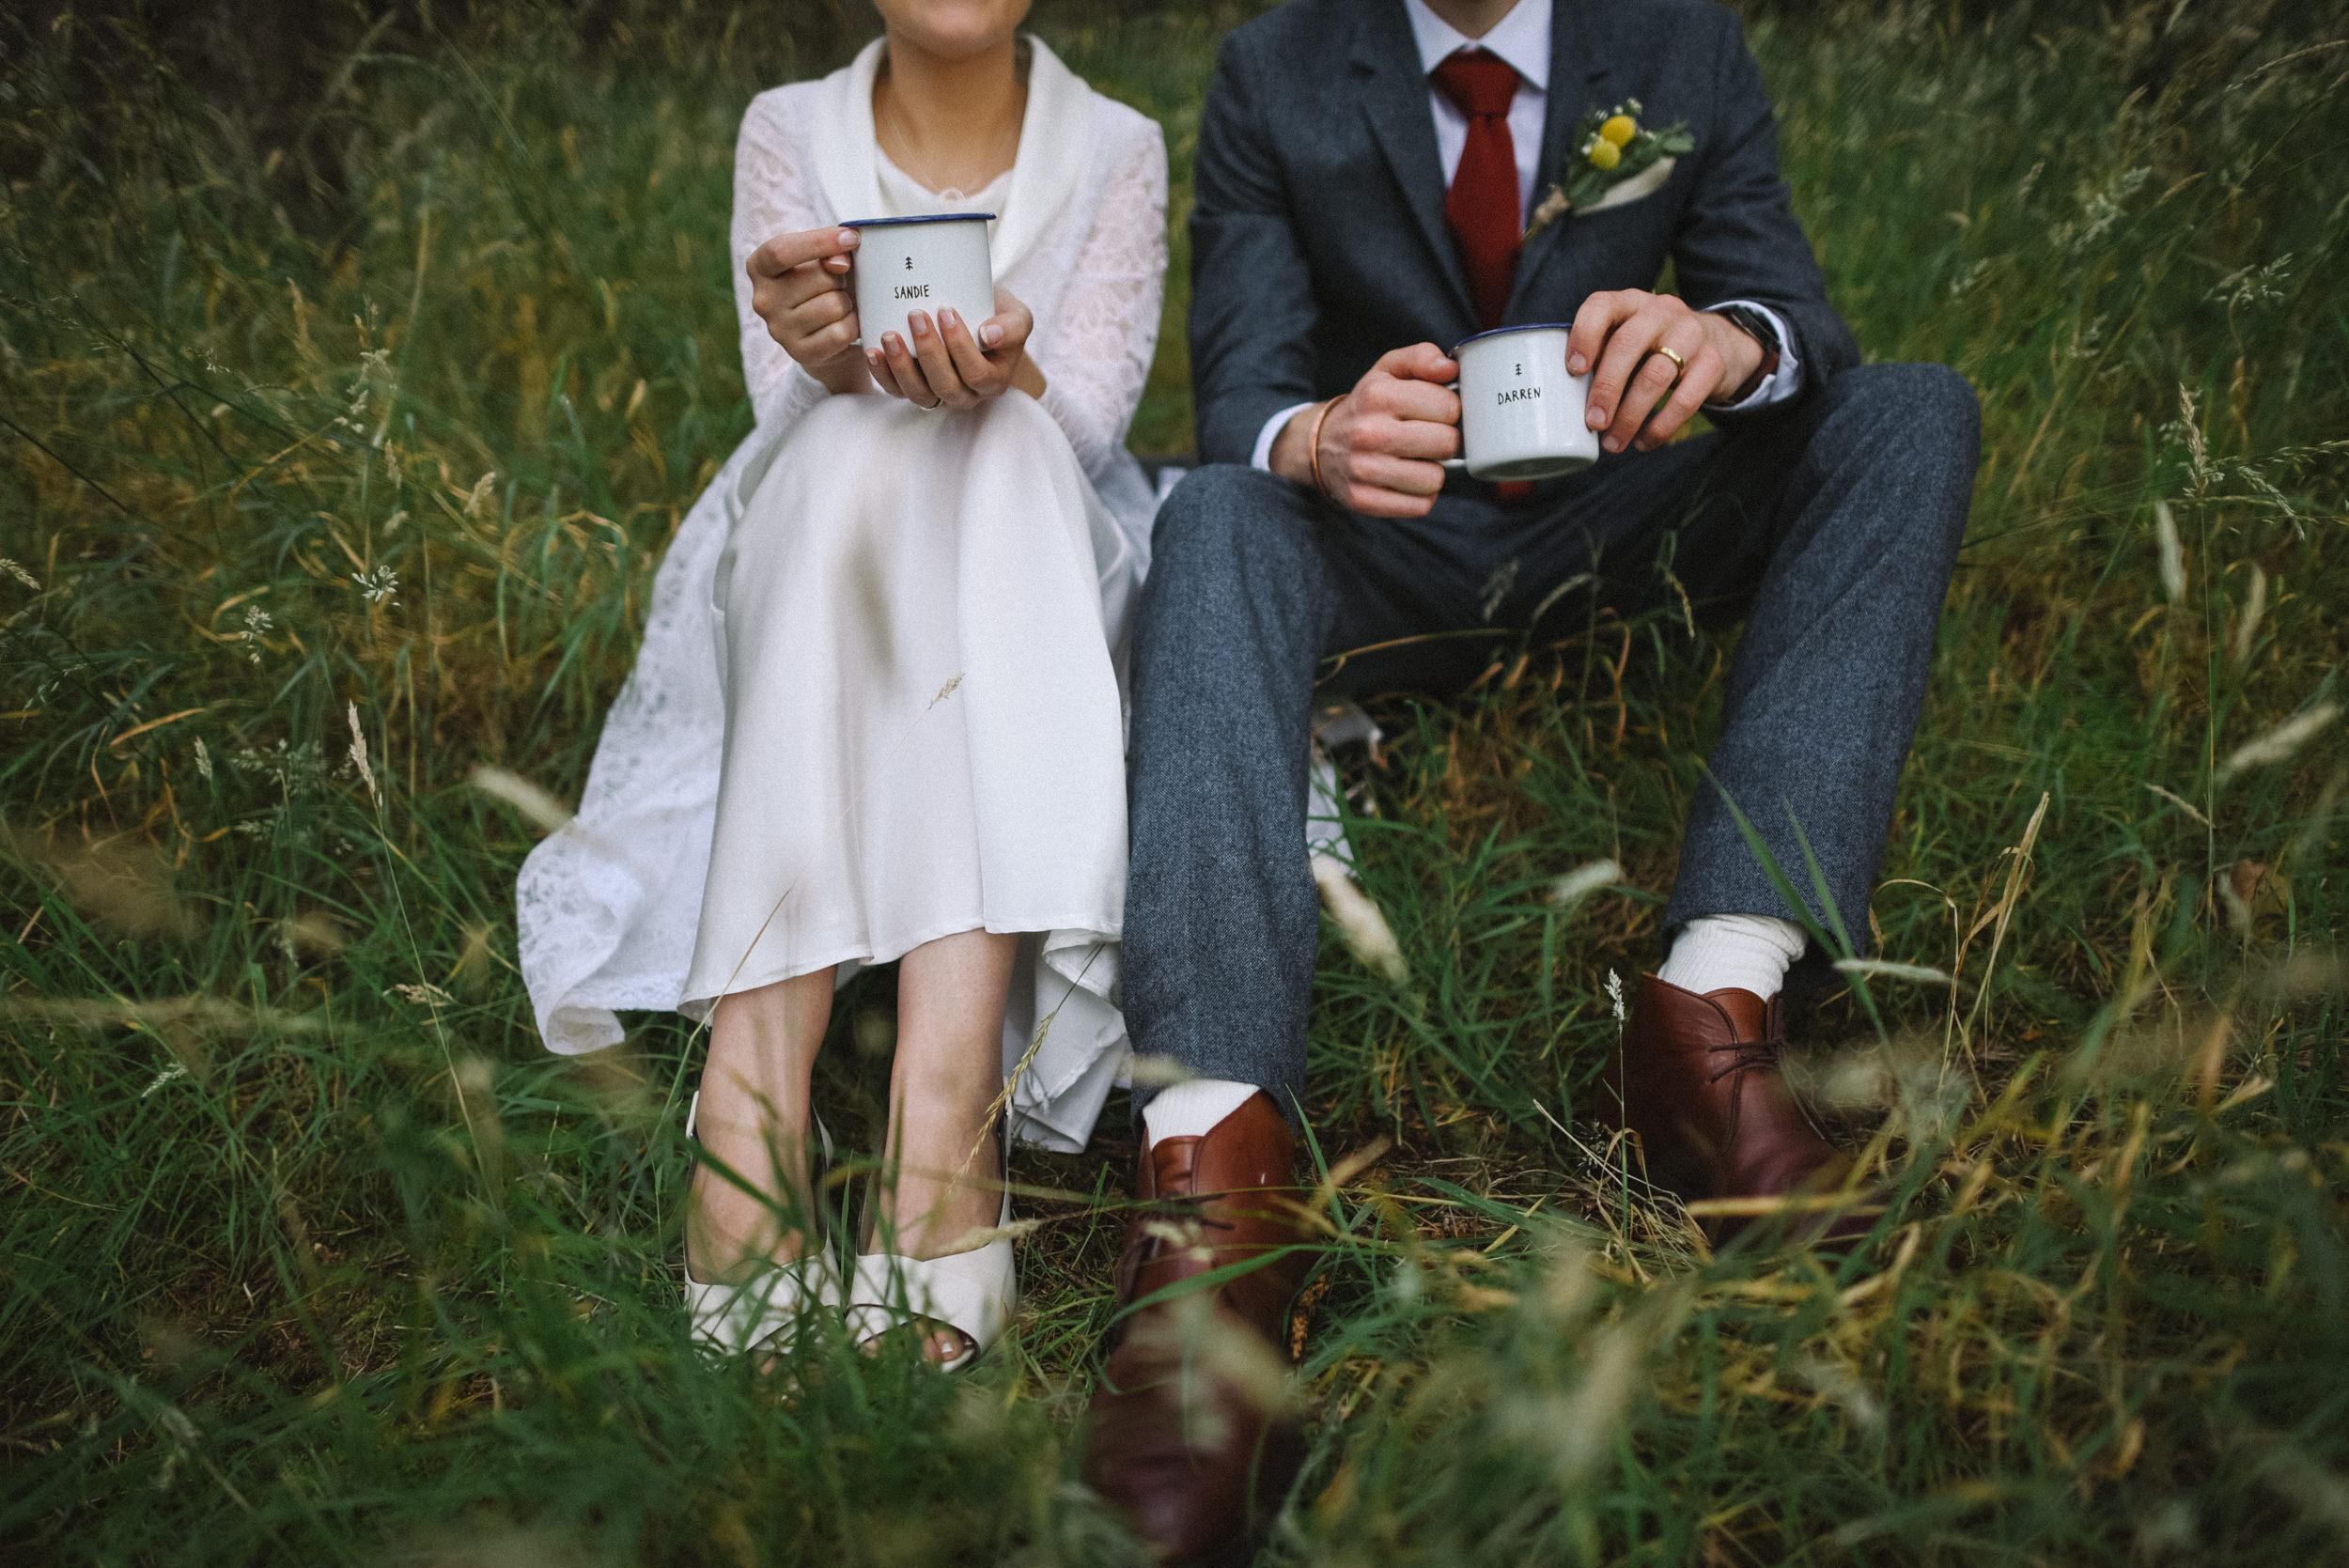 0124-alternative-wedding-portrait-family-kids-photographer-glasgow-scotland.JPG